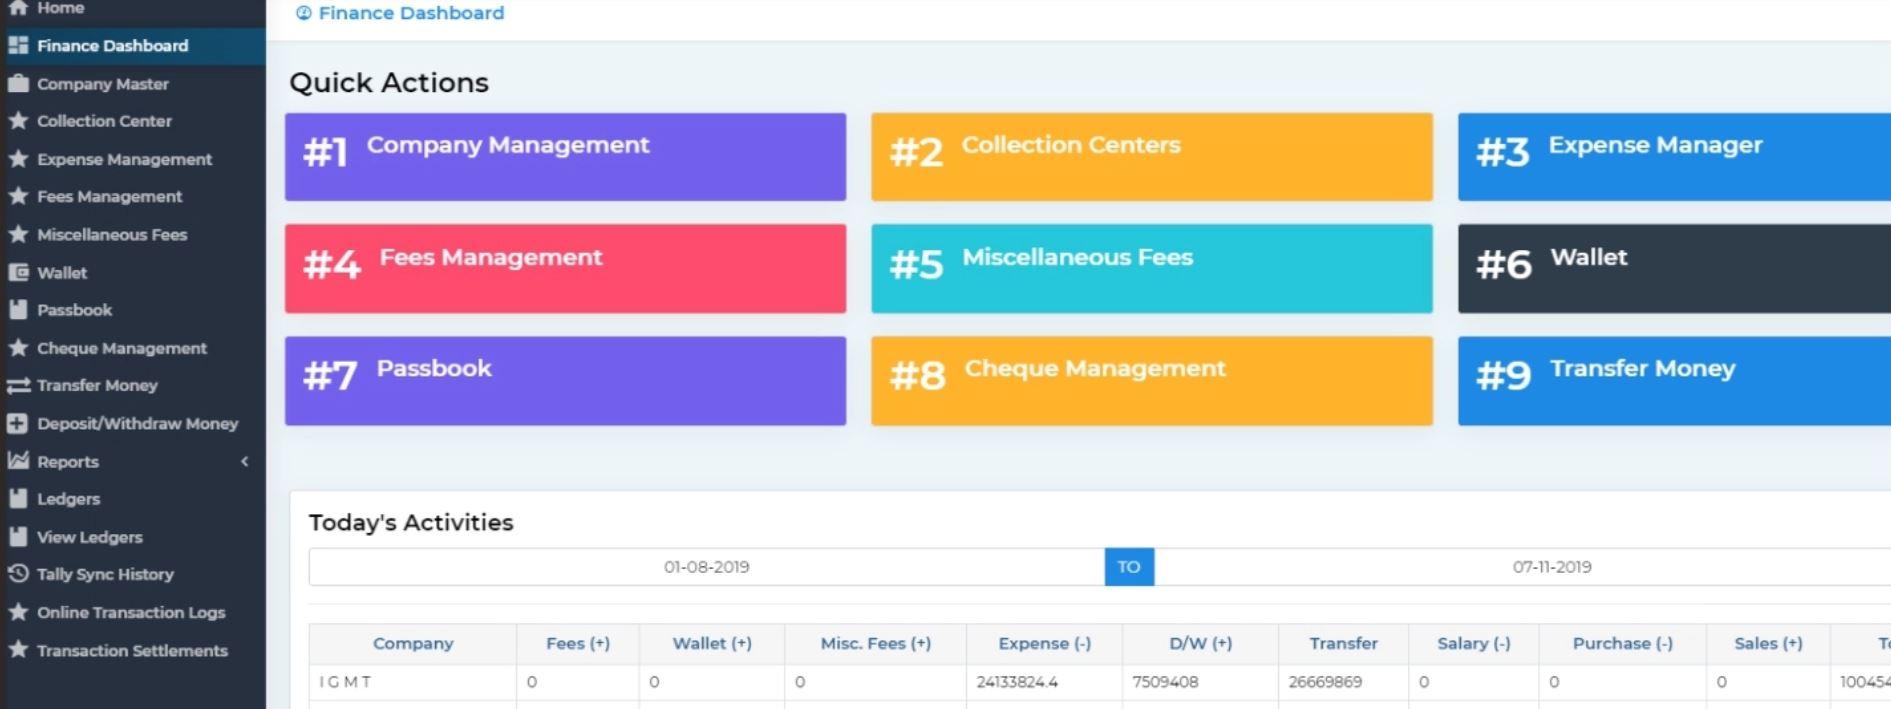 MyClassCampus finance dashboard